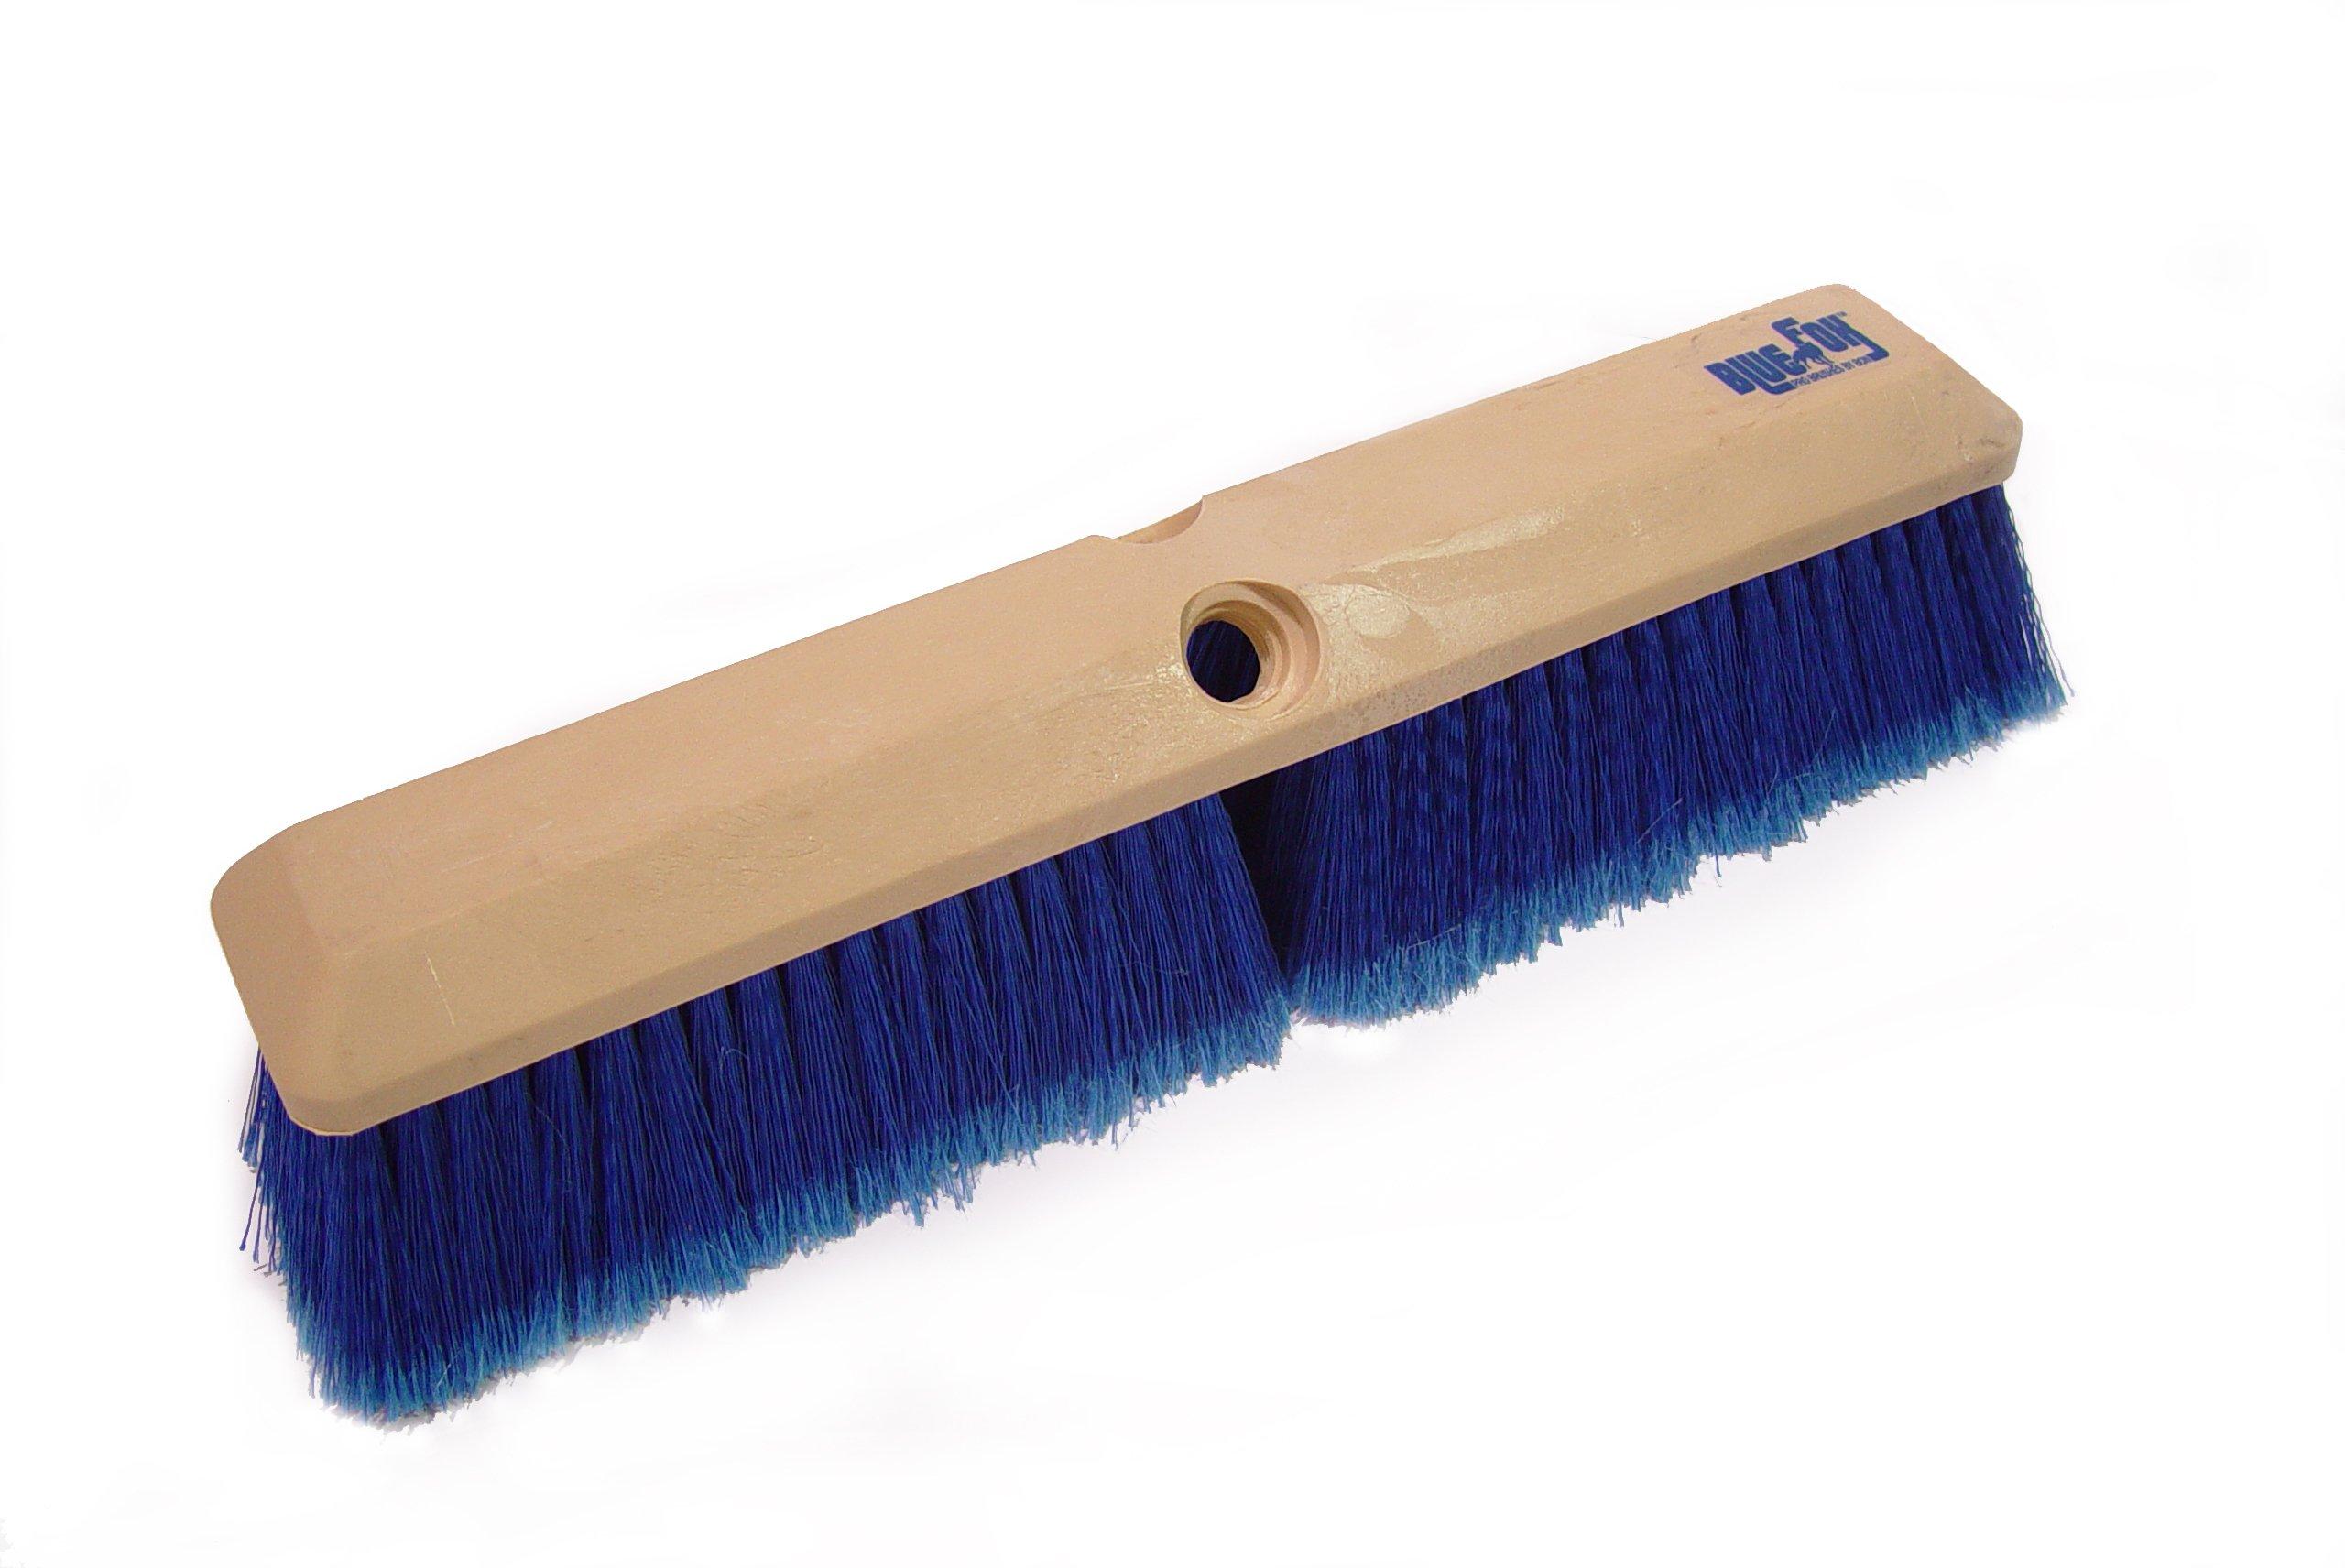 Bon 84-962  Blue Fox Truck Wash and Concrete Finish Brush, 24-Inch Length by 2-1/2-Inch Trim by bon